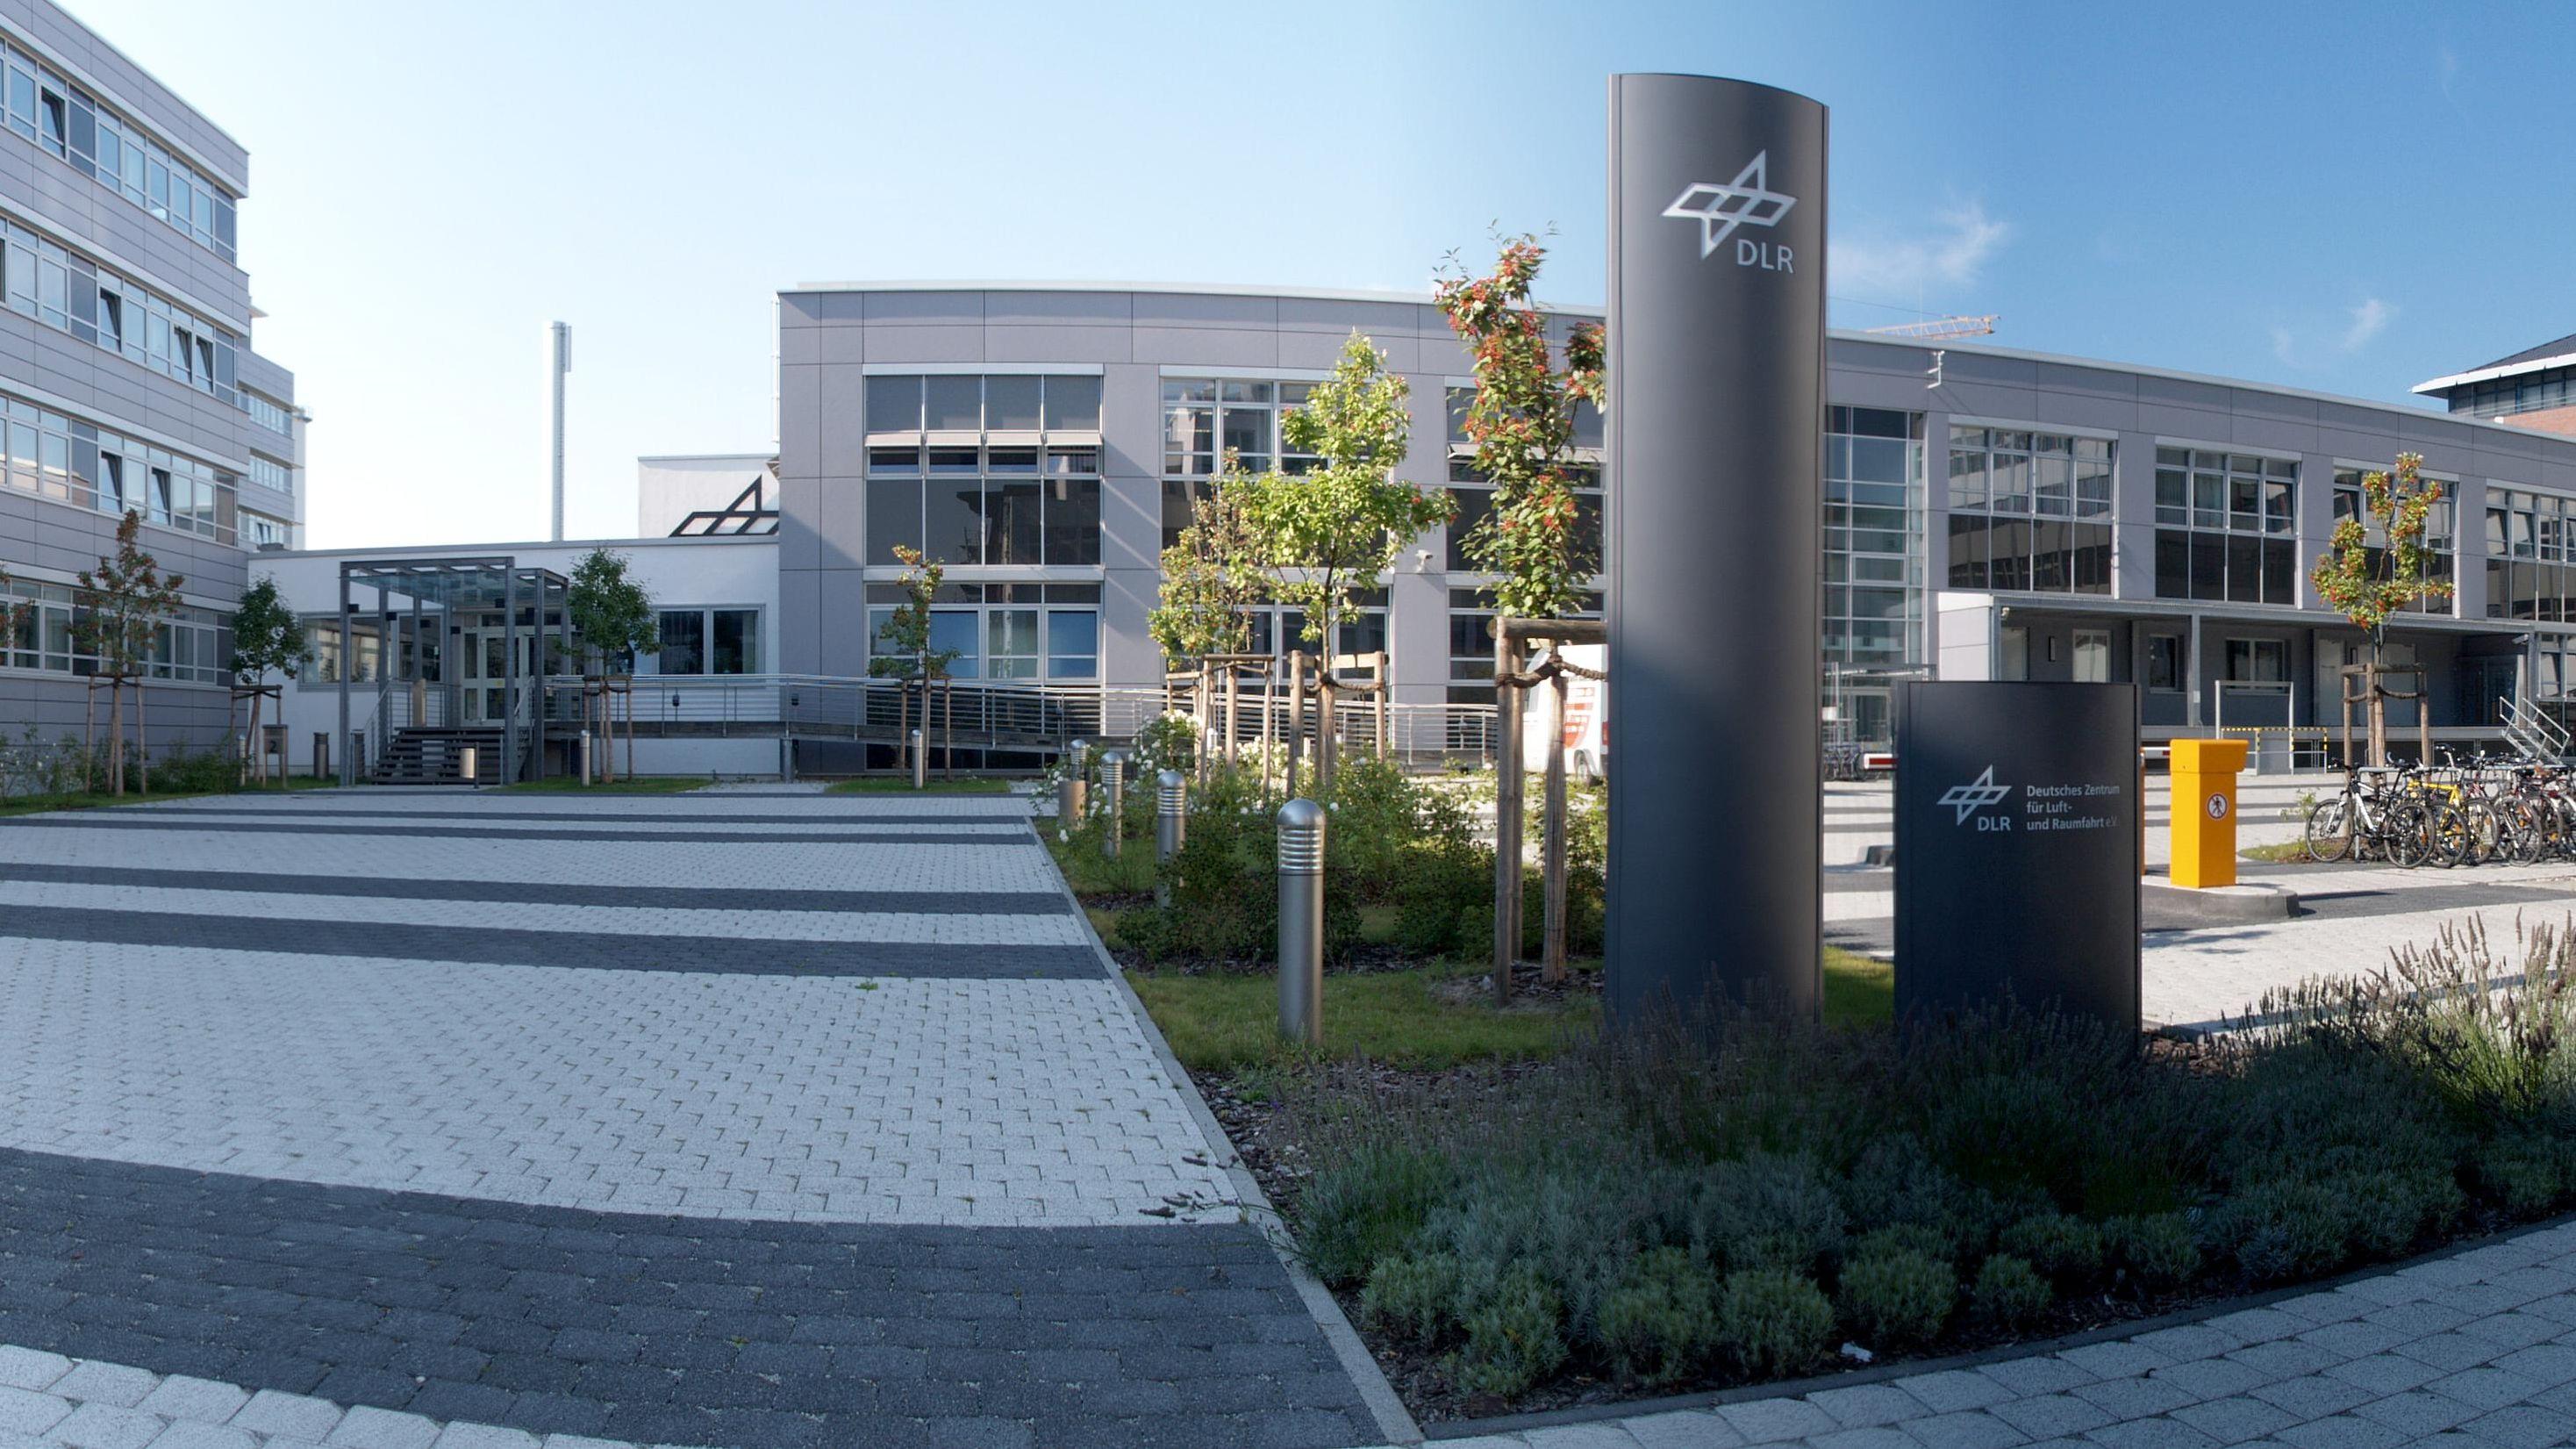 DLR%2dStandort Berlin%2dAdlershof